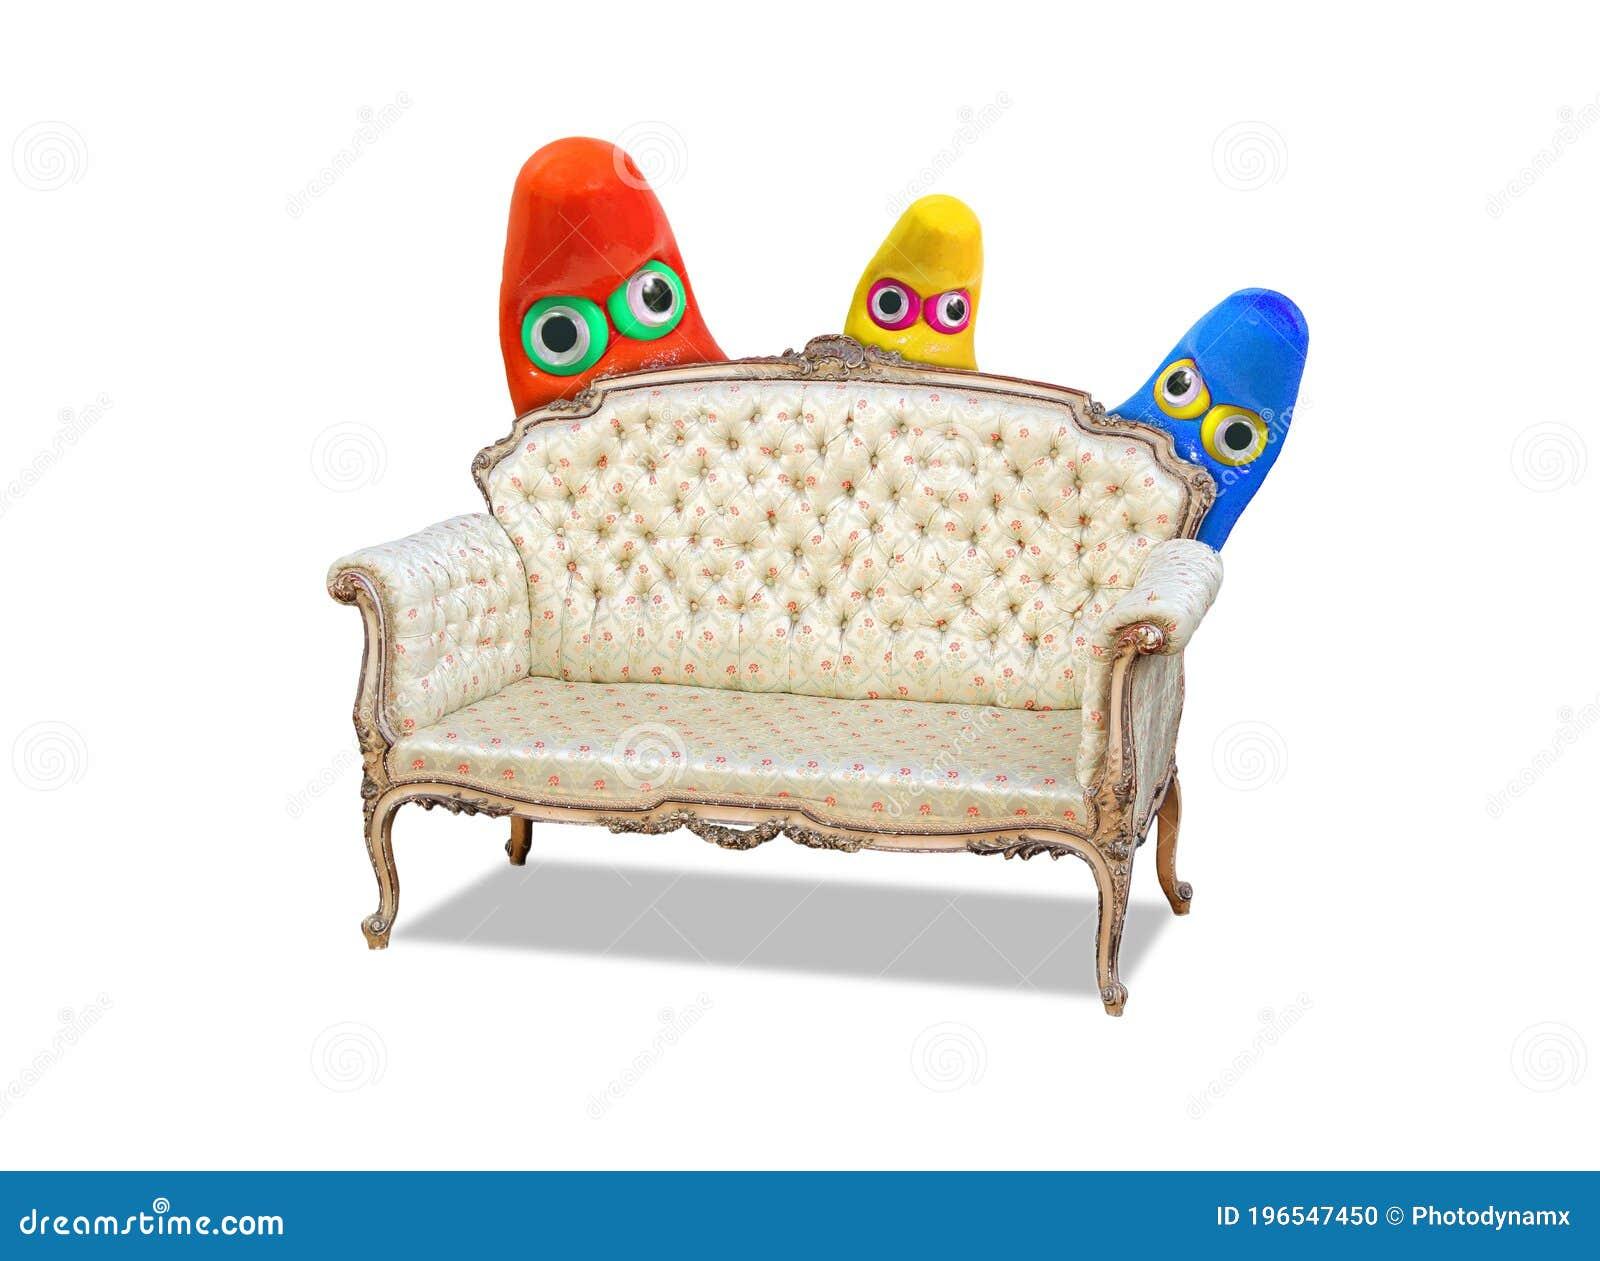 Coronavirus Covid 19 Pandemic Monsters Germs Bugs Hiding Behind Sofa Chair Settee Armchair Chaise Lounge Longue Eyes Watching Stock Photo Image Of Coronavirus Biological 196547450